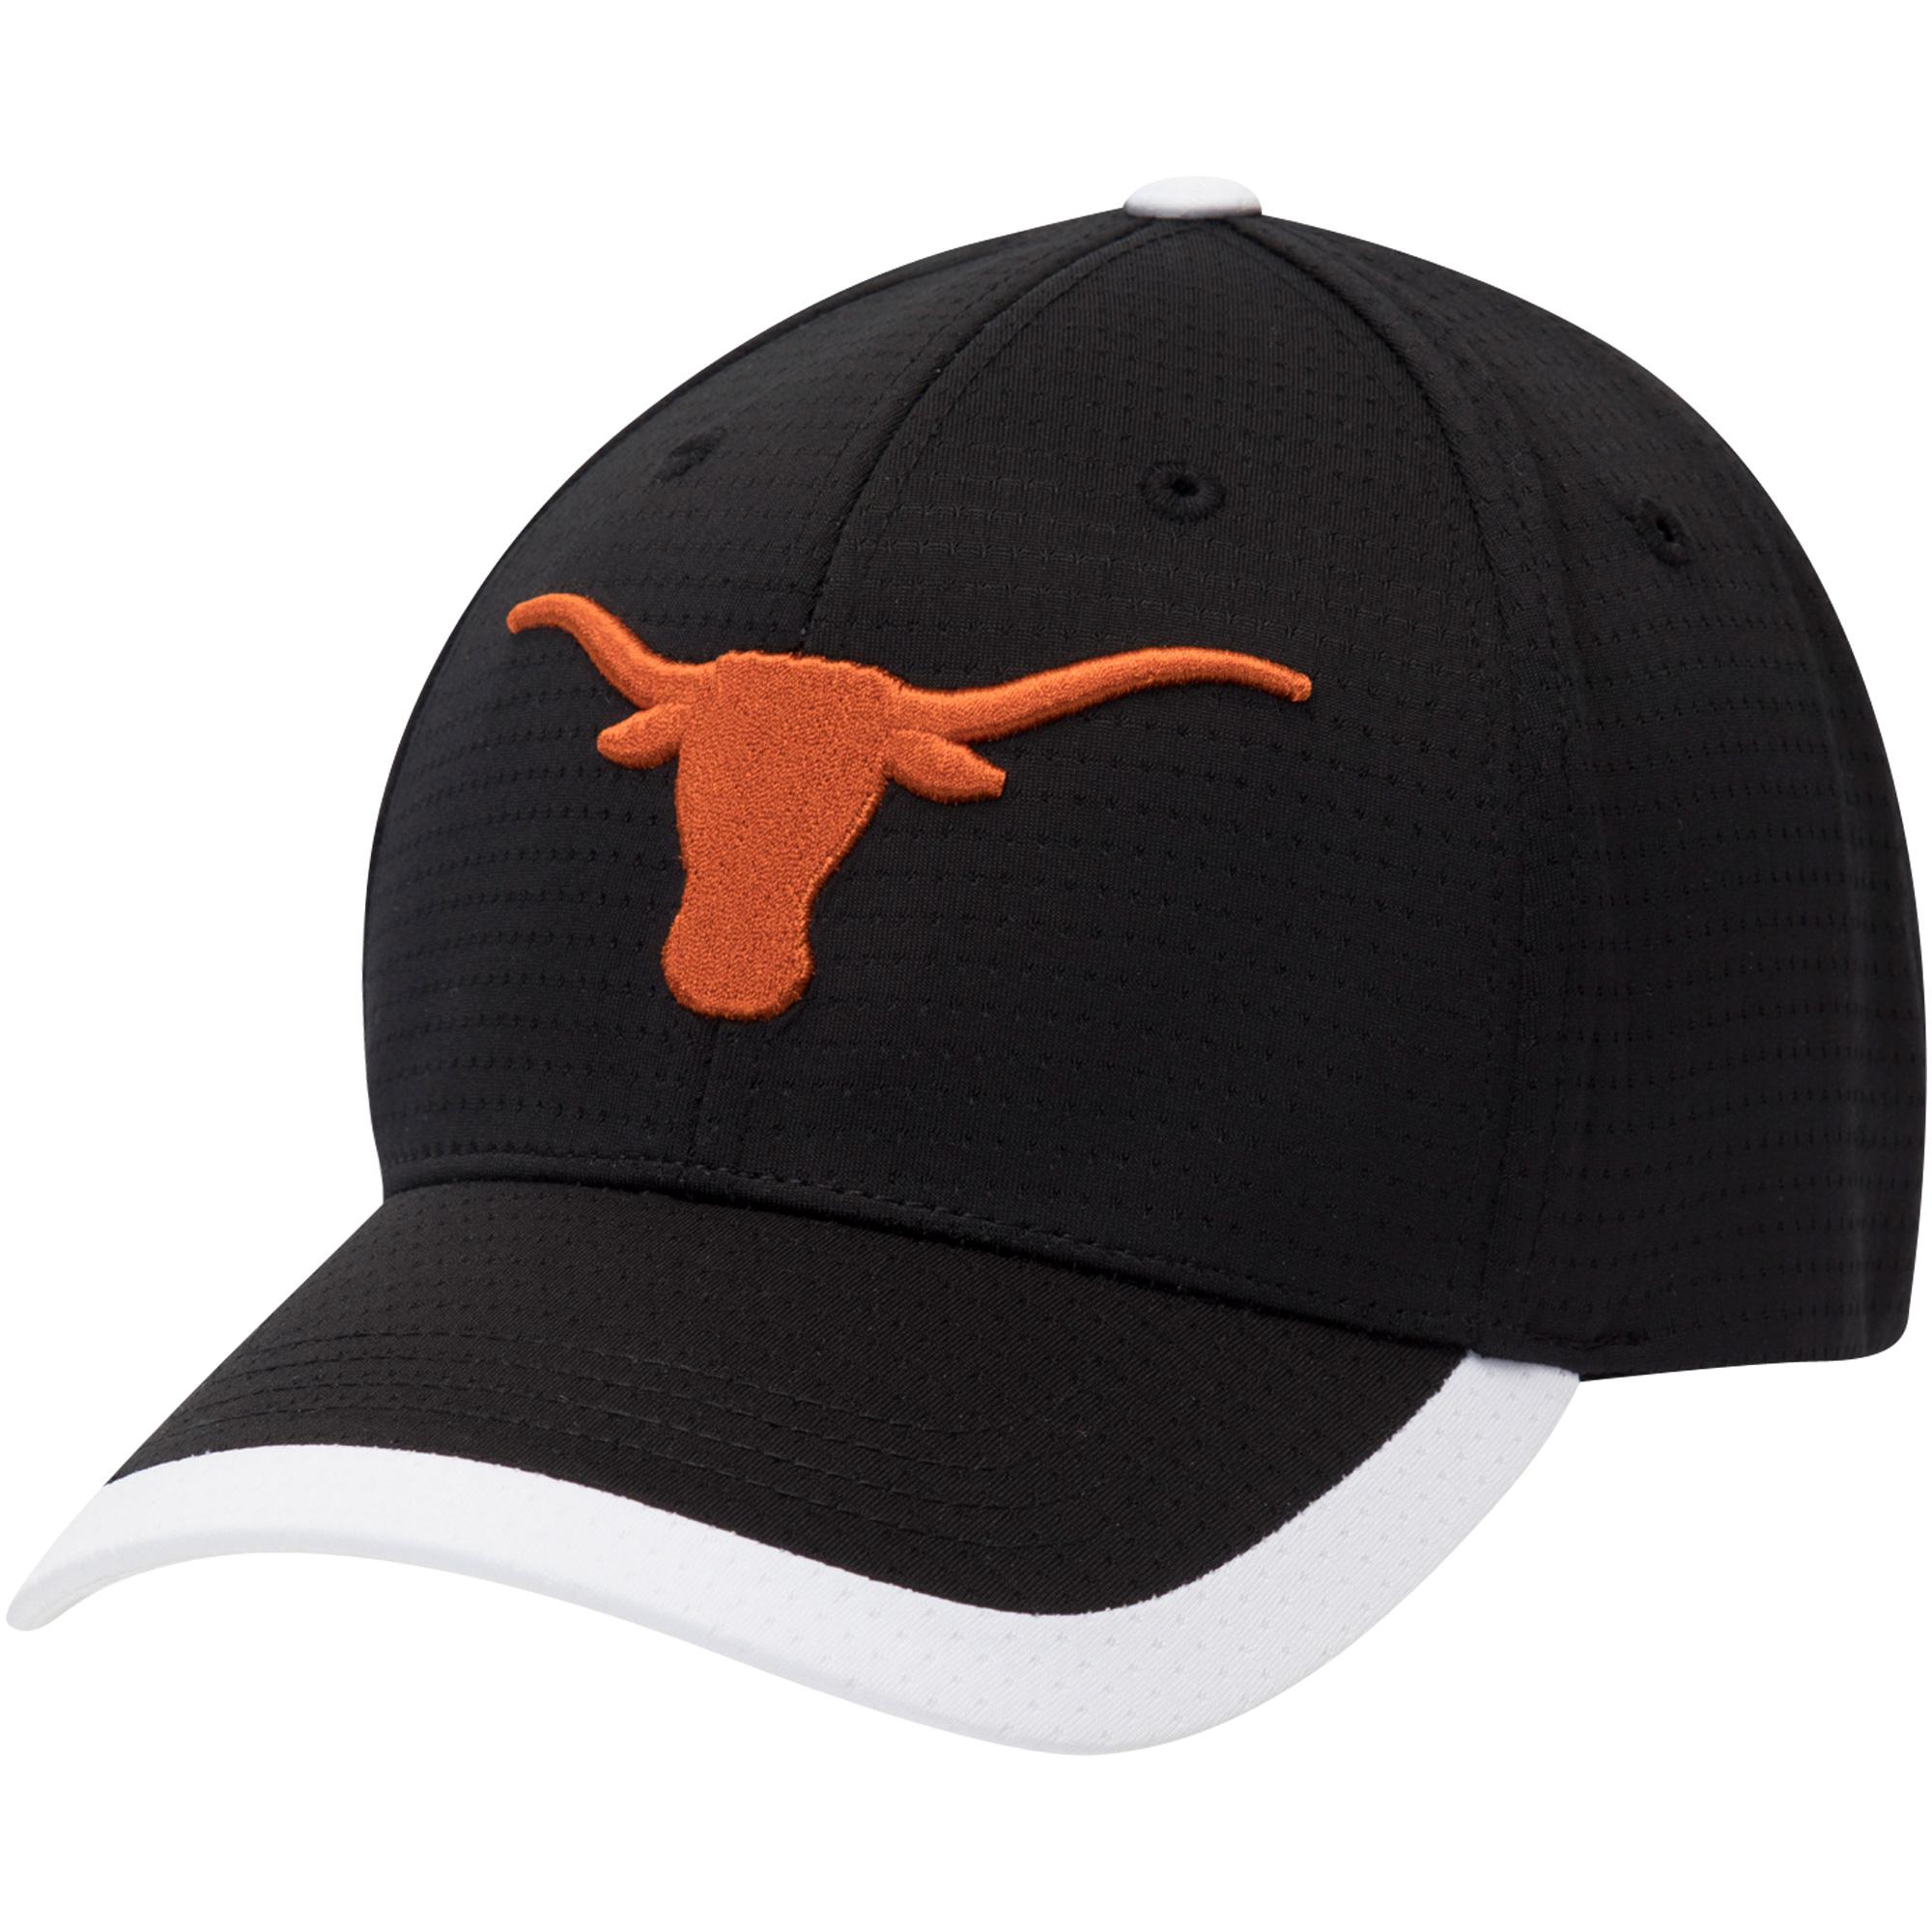 Men's Black Texas Longhorns Dunlap Adjustable Hat - OSFA